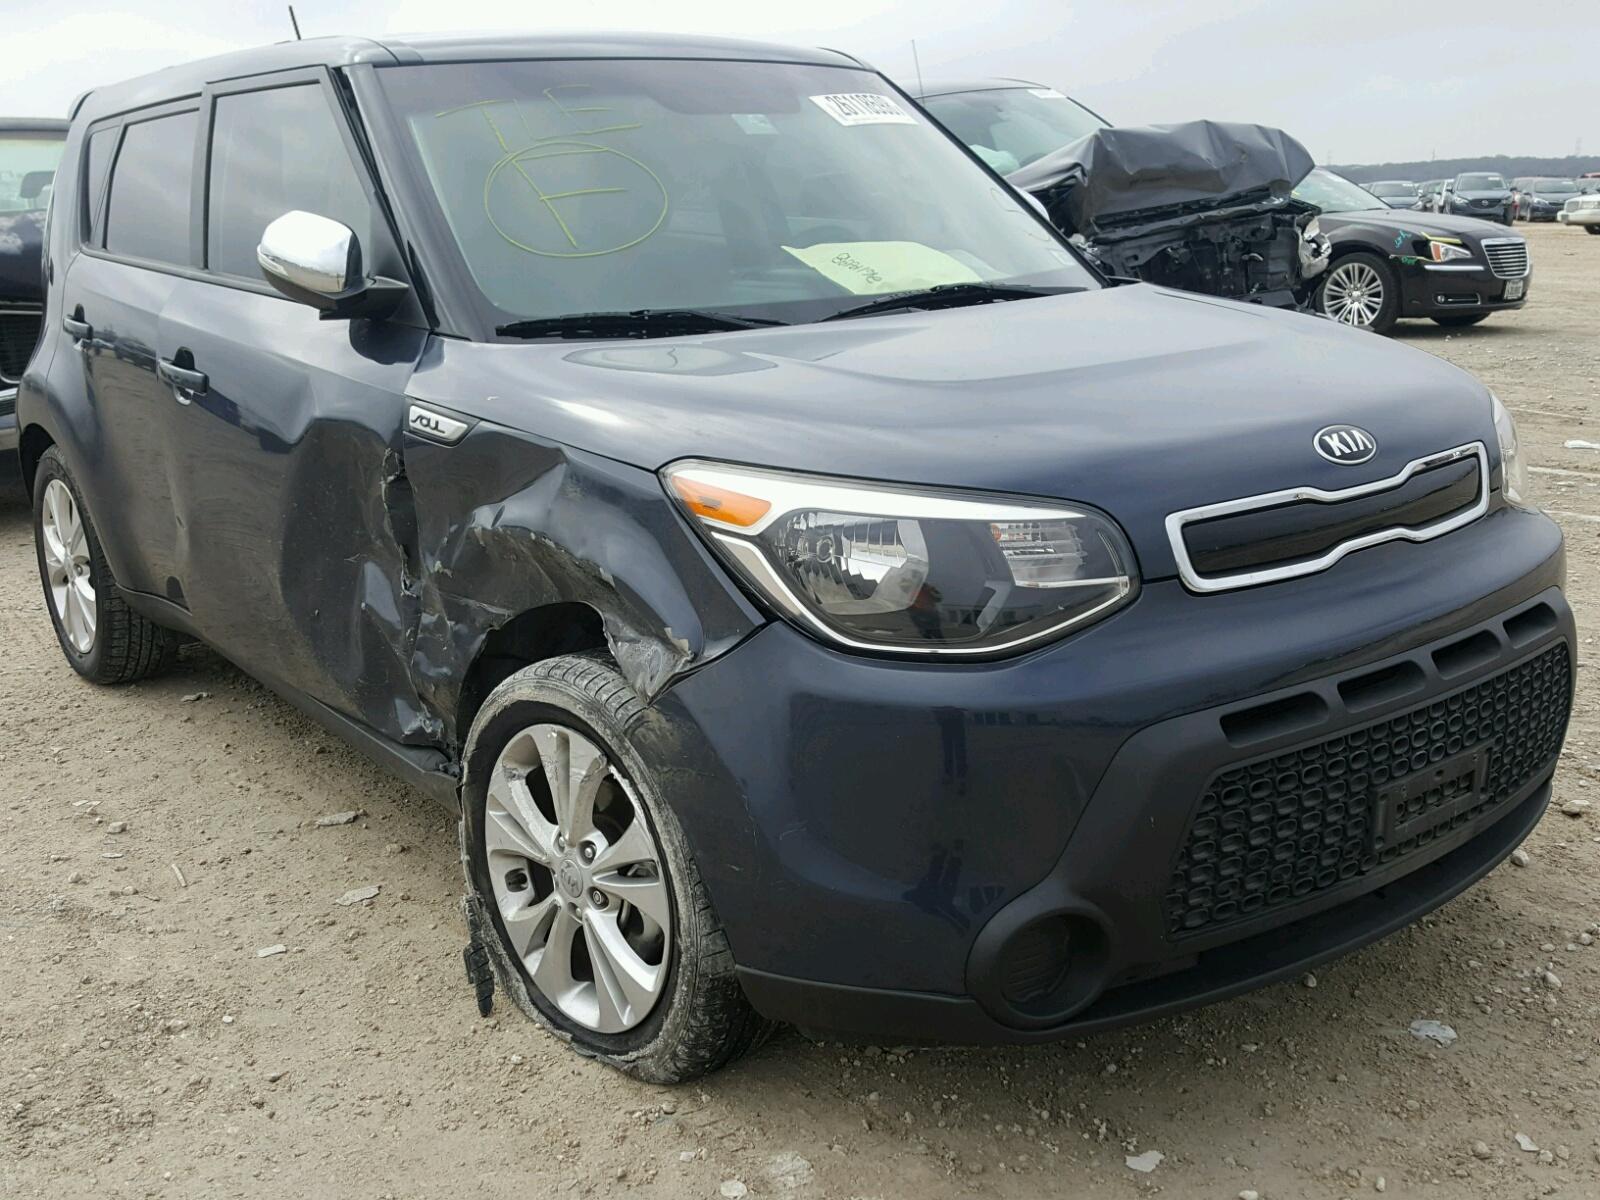 com usa direct used kia auction at image sale cars for